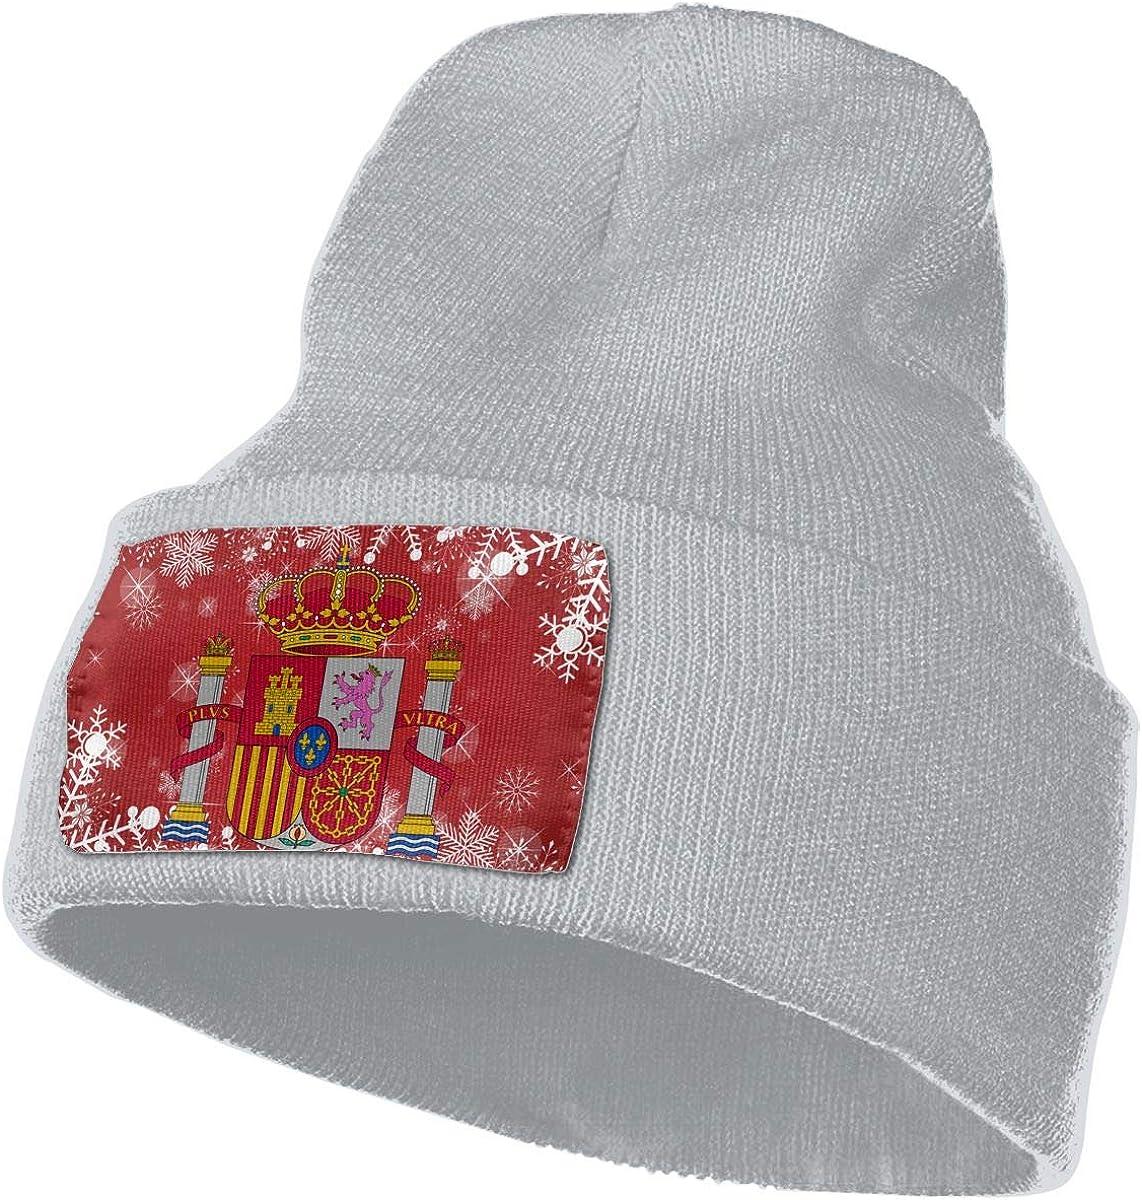 Spain Flag Men Women Knit Hats Stretchy /& Soft Skull Cap Beanie